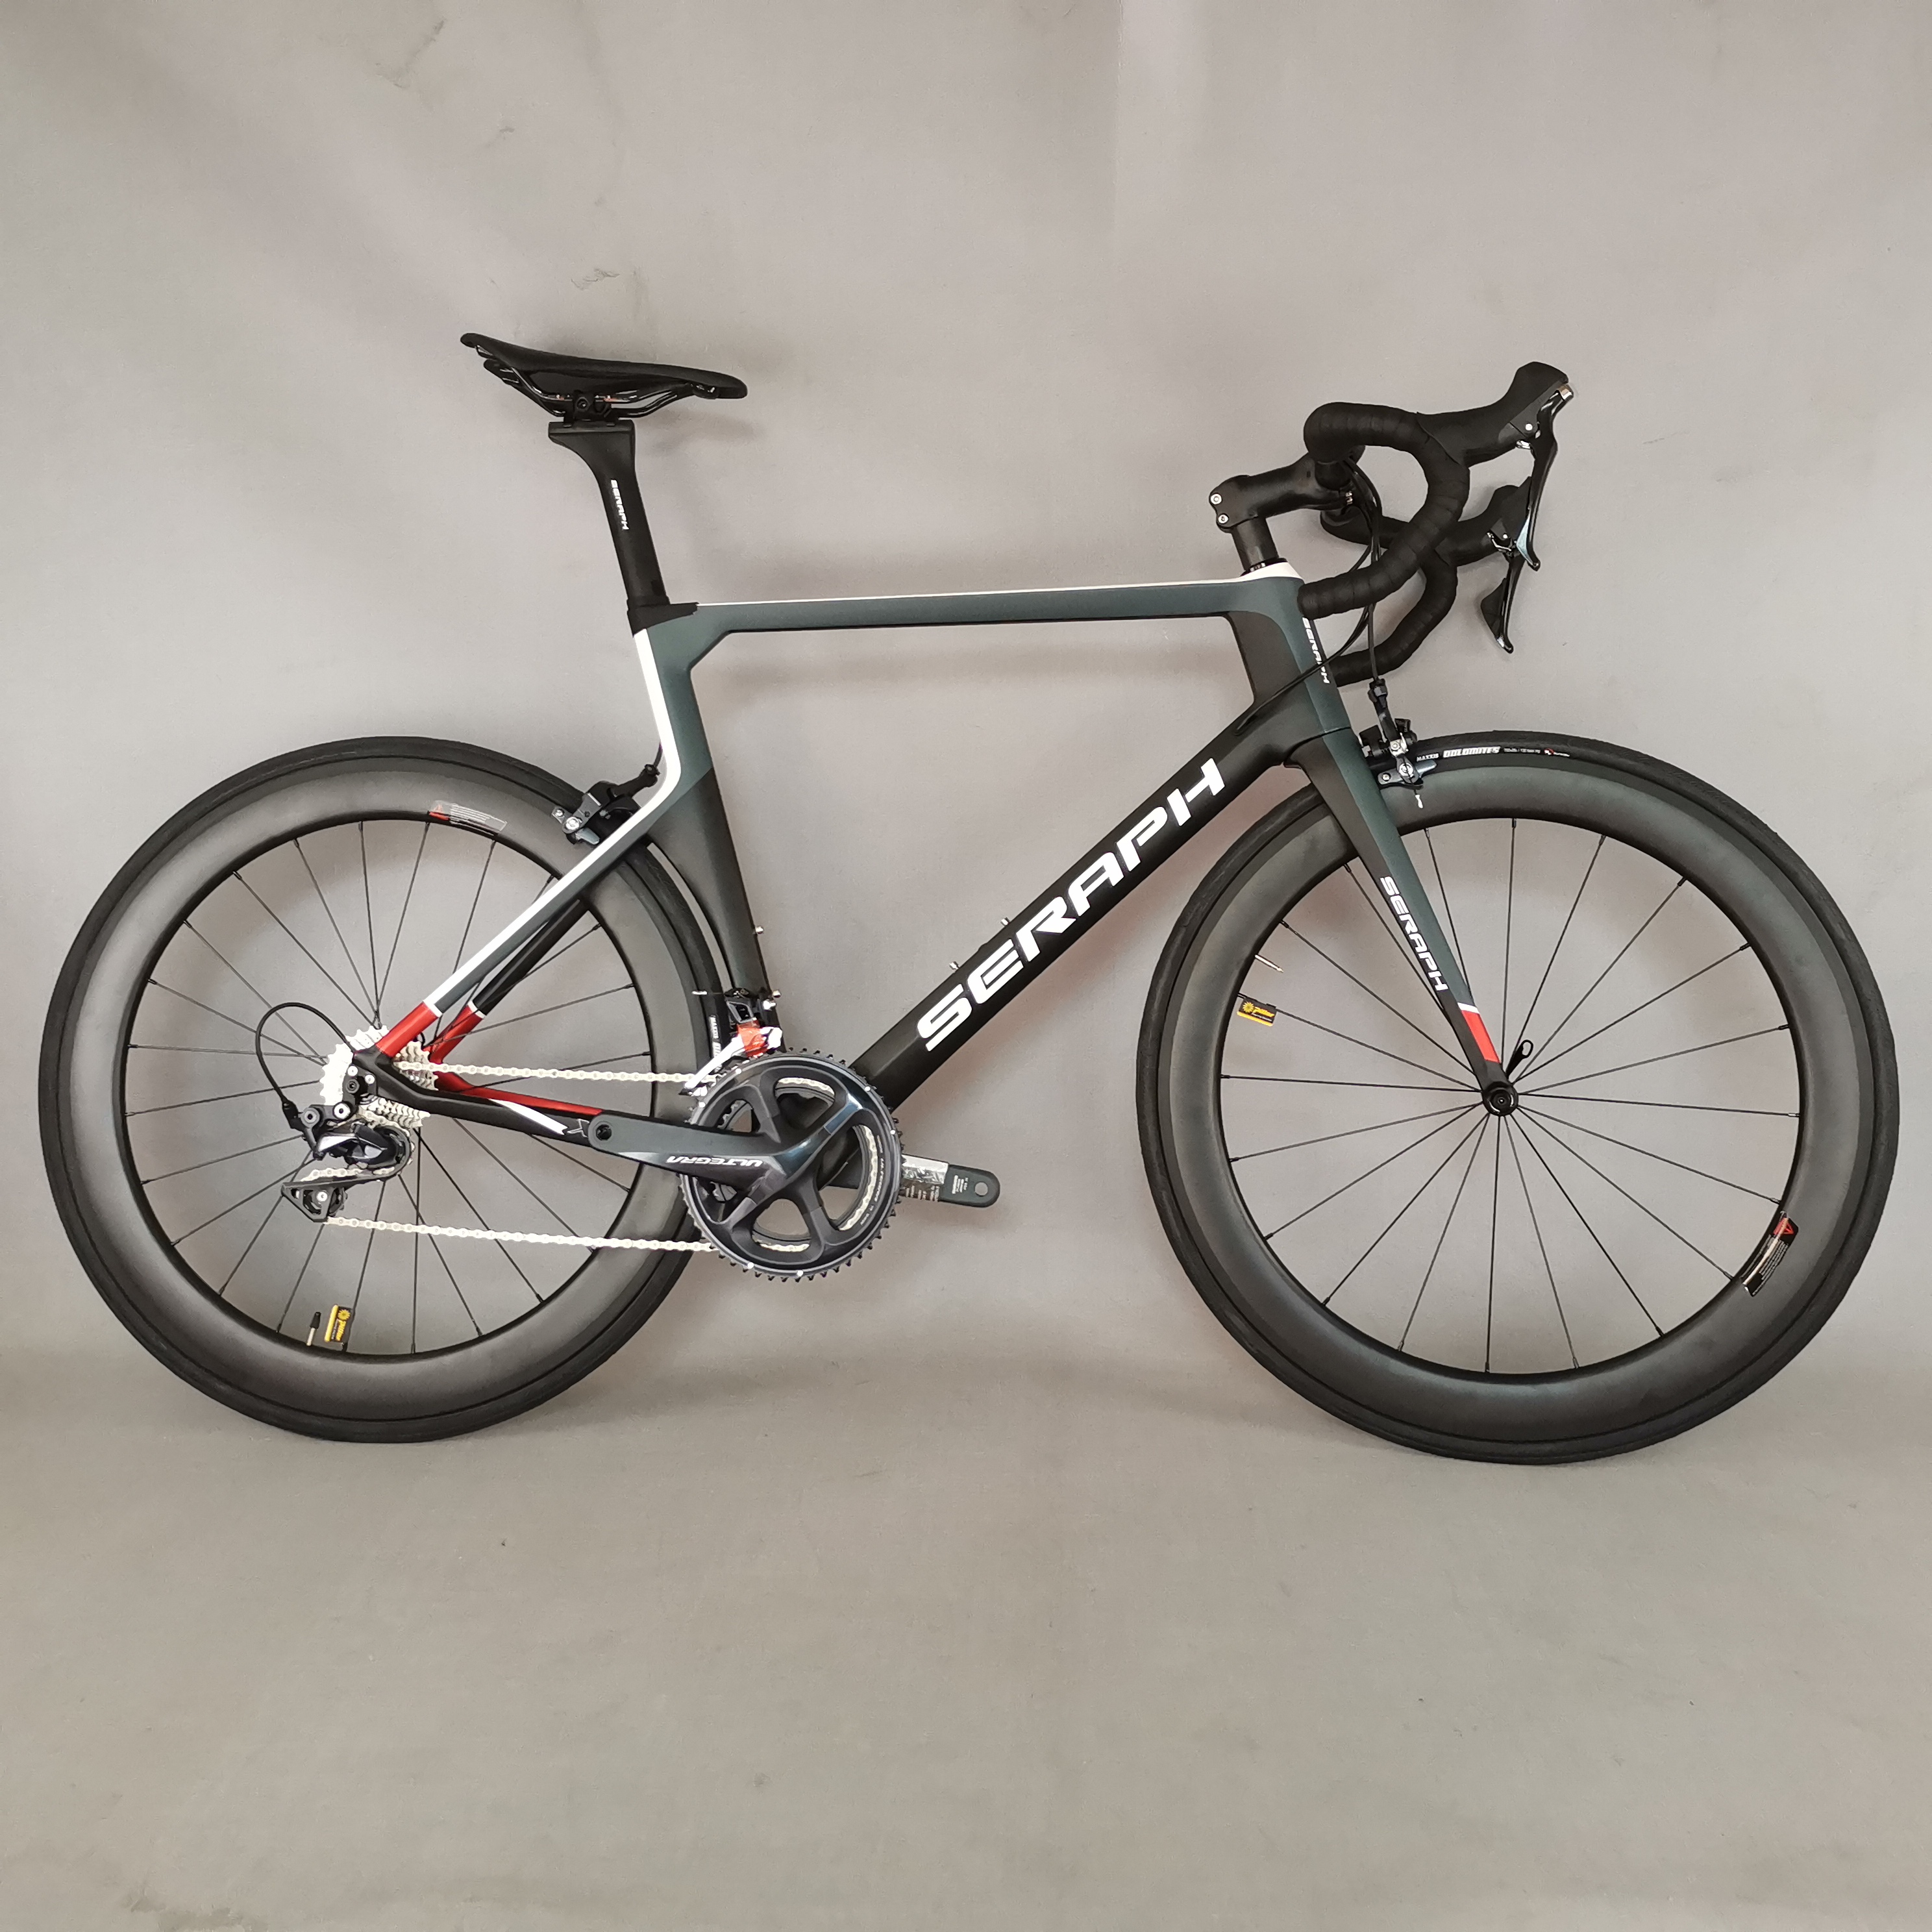 Shimao R8000 Groupset  Complete Bike  Carbon Road Bike /22 Speed Carbon Road Bike/ Factory Price Carbon Road Bike